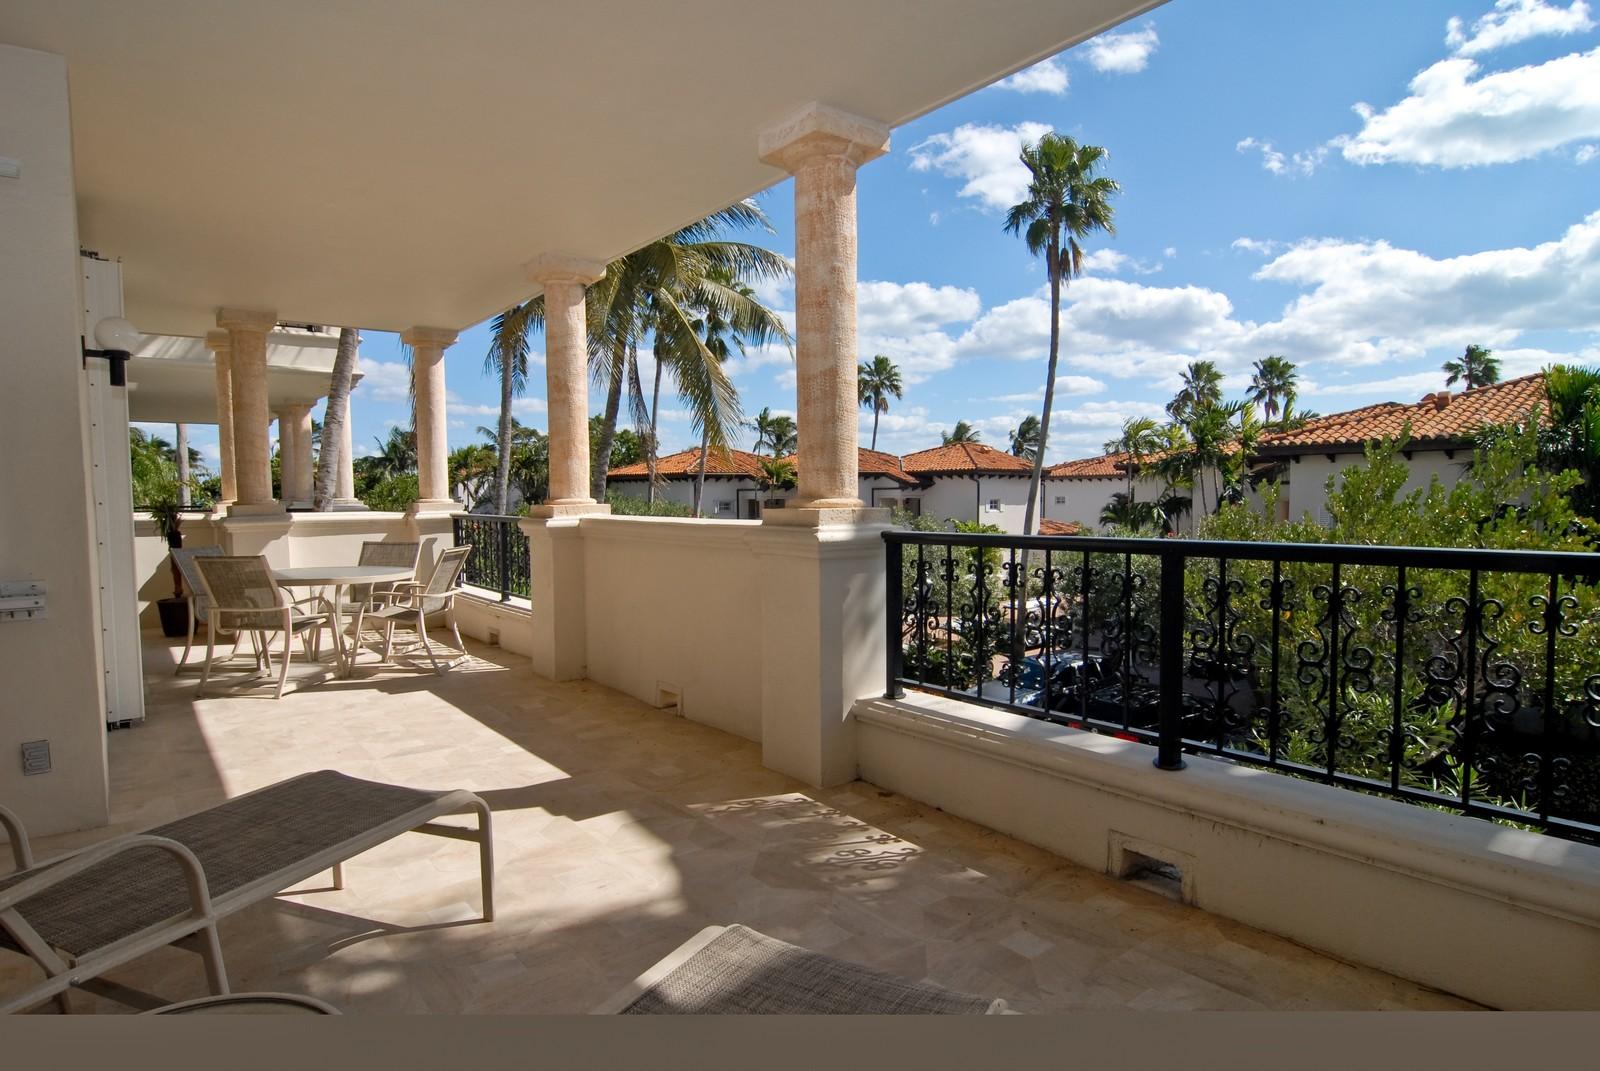 Real Estate Photography - 19124 Fisher Island Drive, Fisher Island, FL, 33109 - Balcony